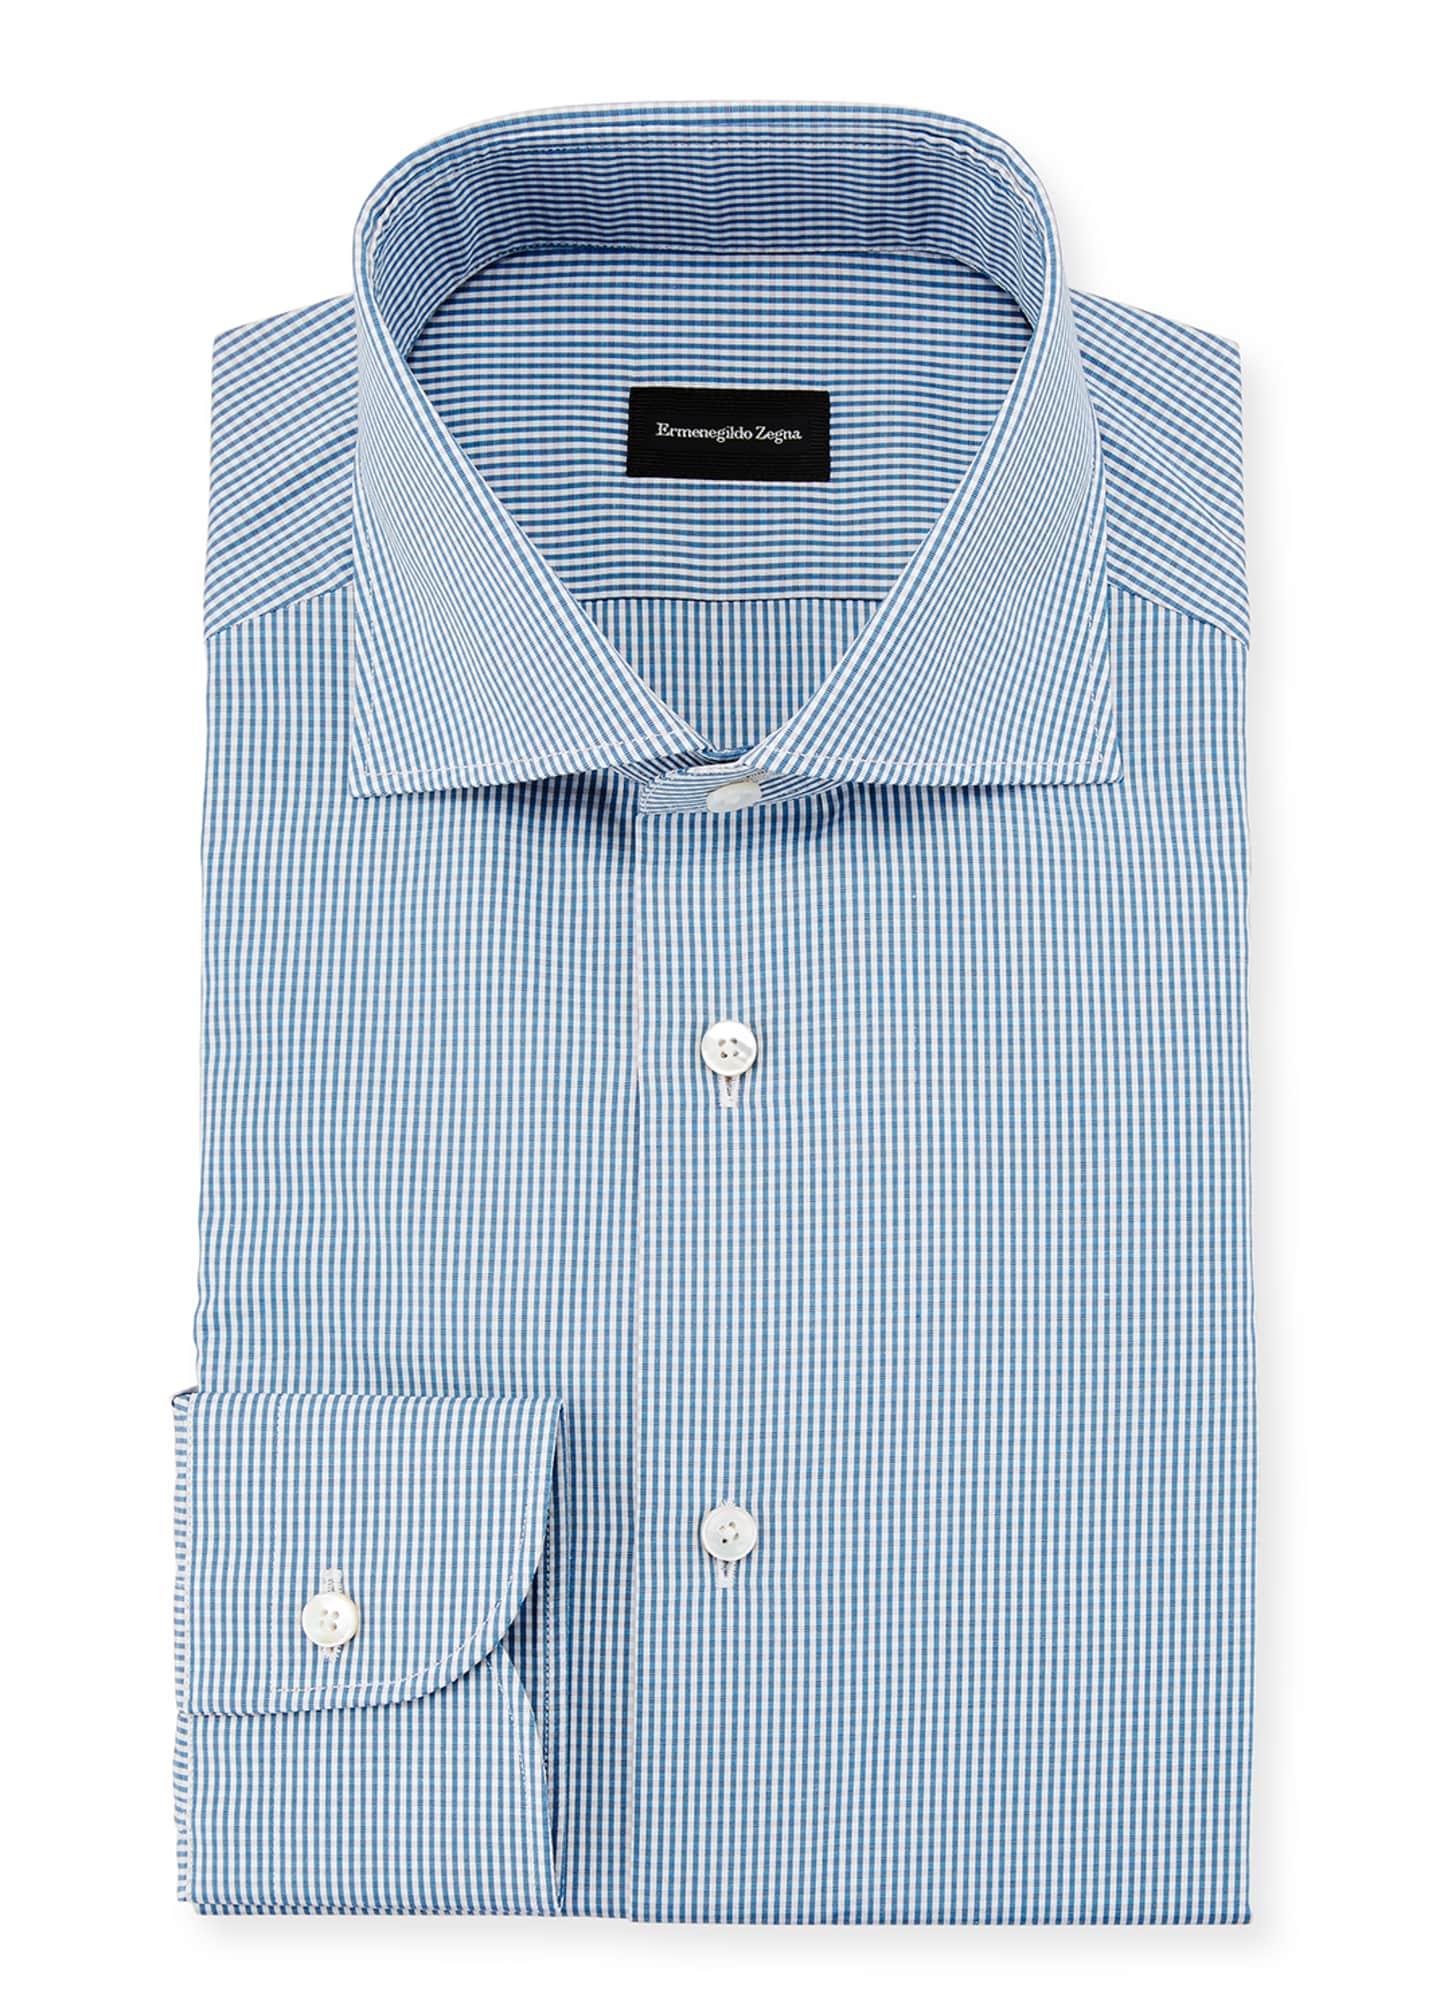 Ermenegildo Zegna Gingham Dress Shirt